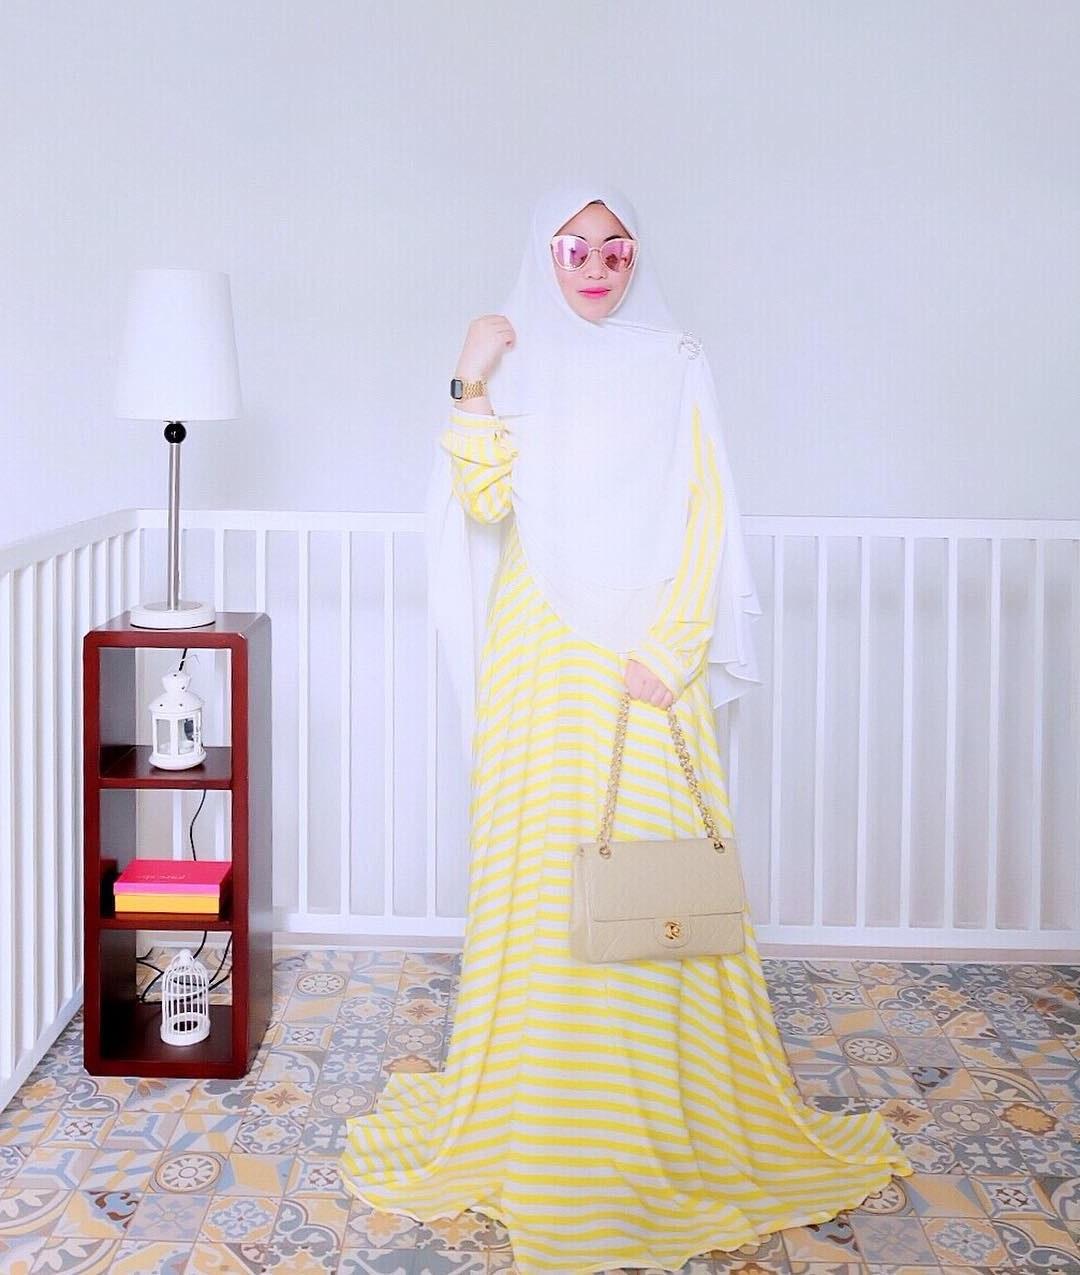 Ide Baju Lebaran Syari Dwdk 21 Model Gamis Lebaran 2018 Desain Elegan Casual Dan Modern